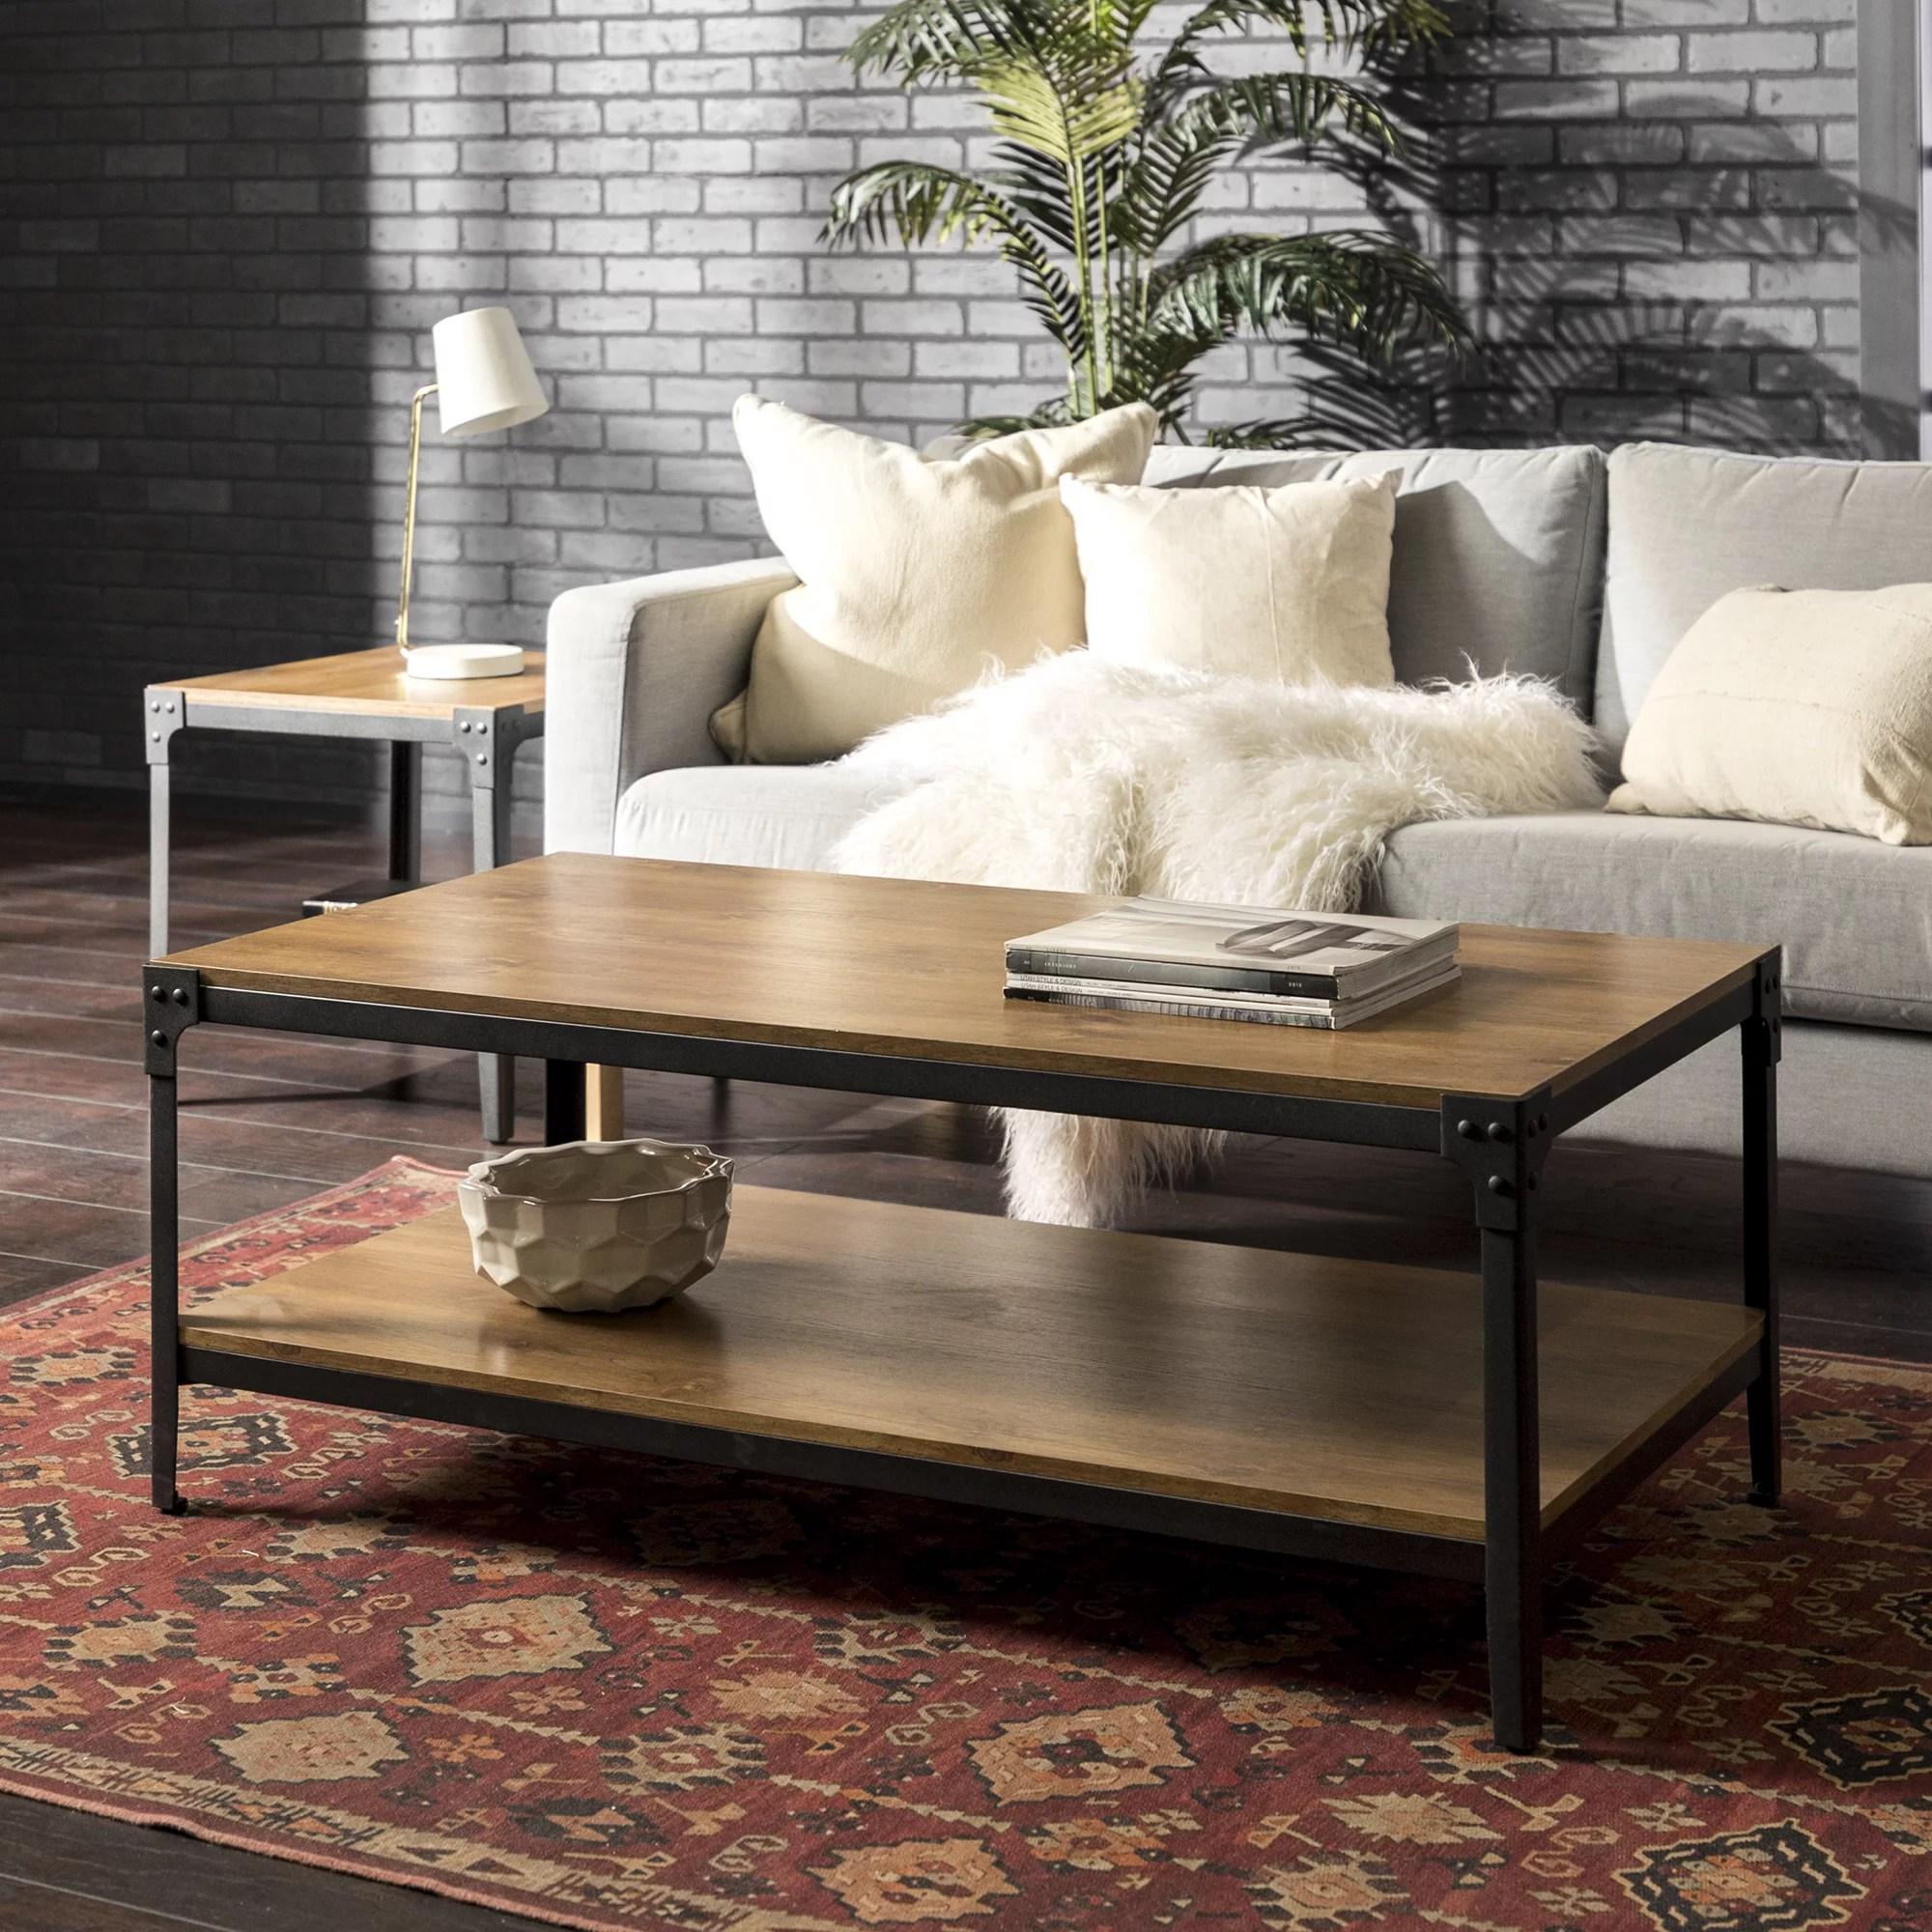 wilson riveted barnwood coffee table by river street designs walmart com